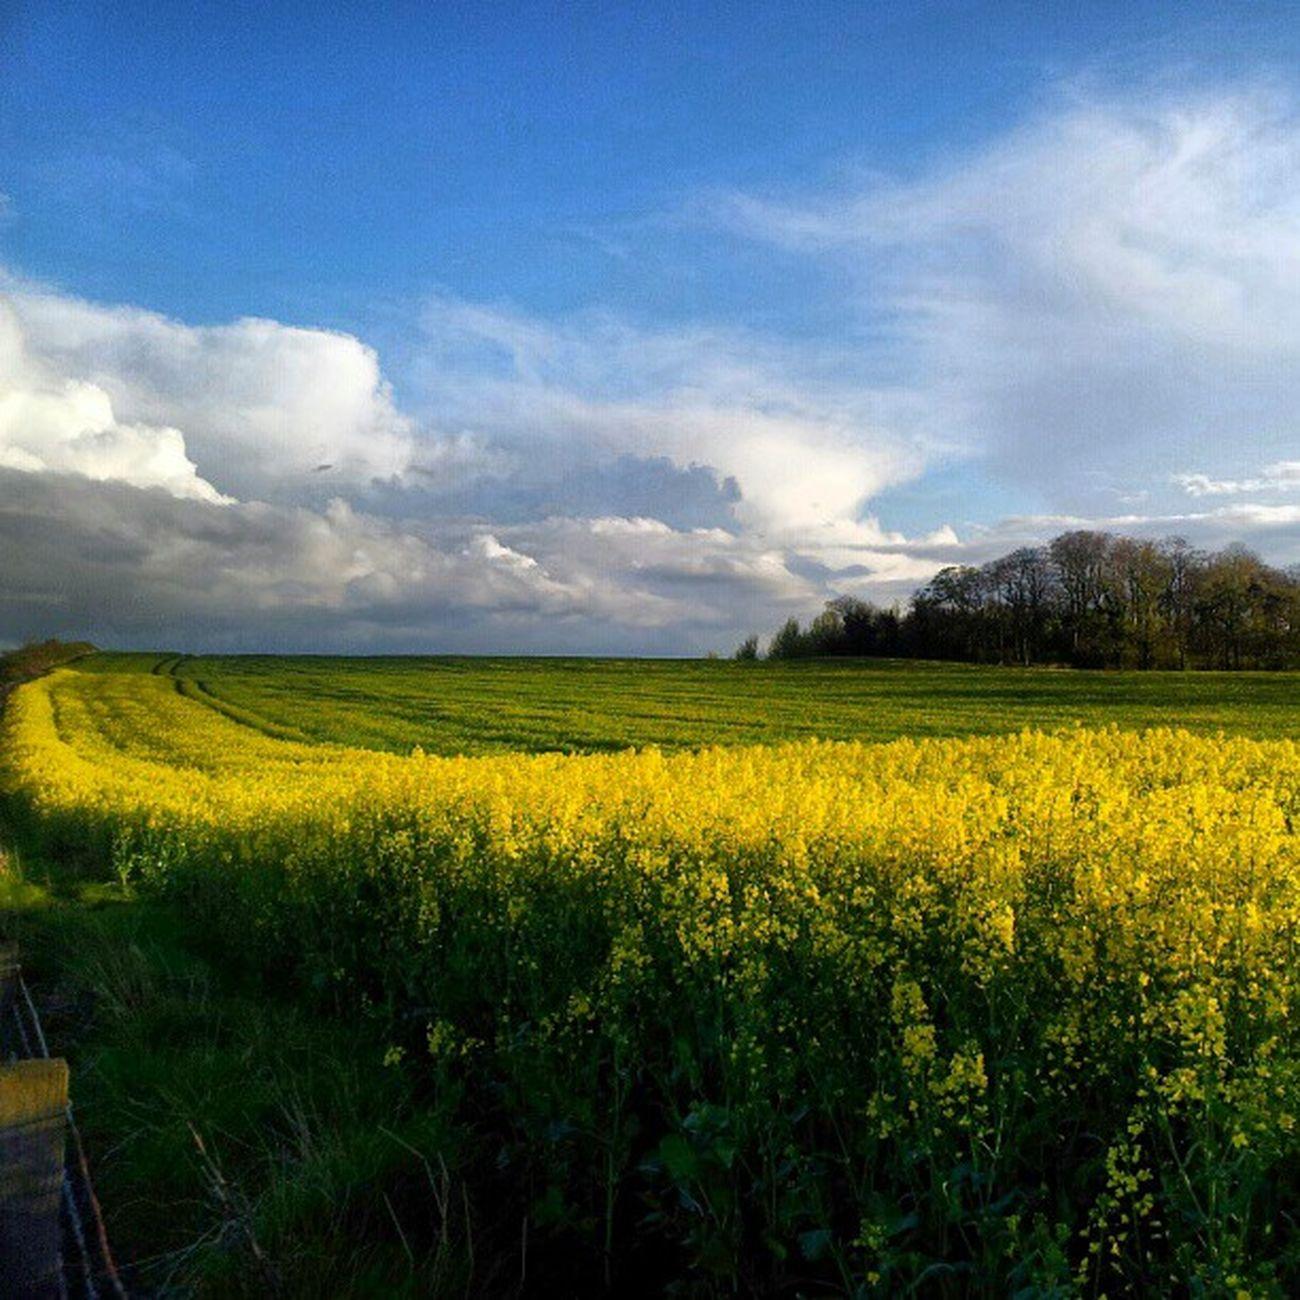 'Field of Gold' Dunfermline Fife  Scotland Cloudreality cloudatlas Clouds Cloudporn skysnappers skyporn sky yellow Fields Instagrampolis instamob insta_underdog instahub